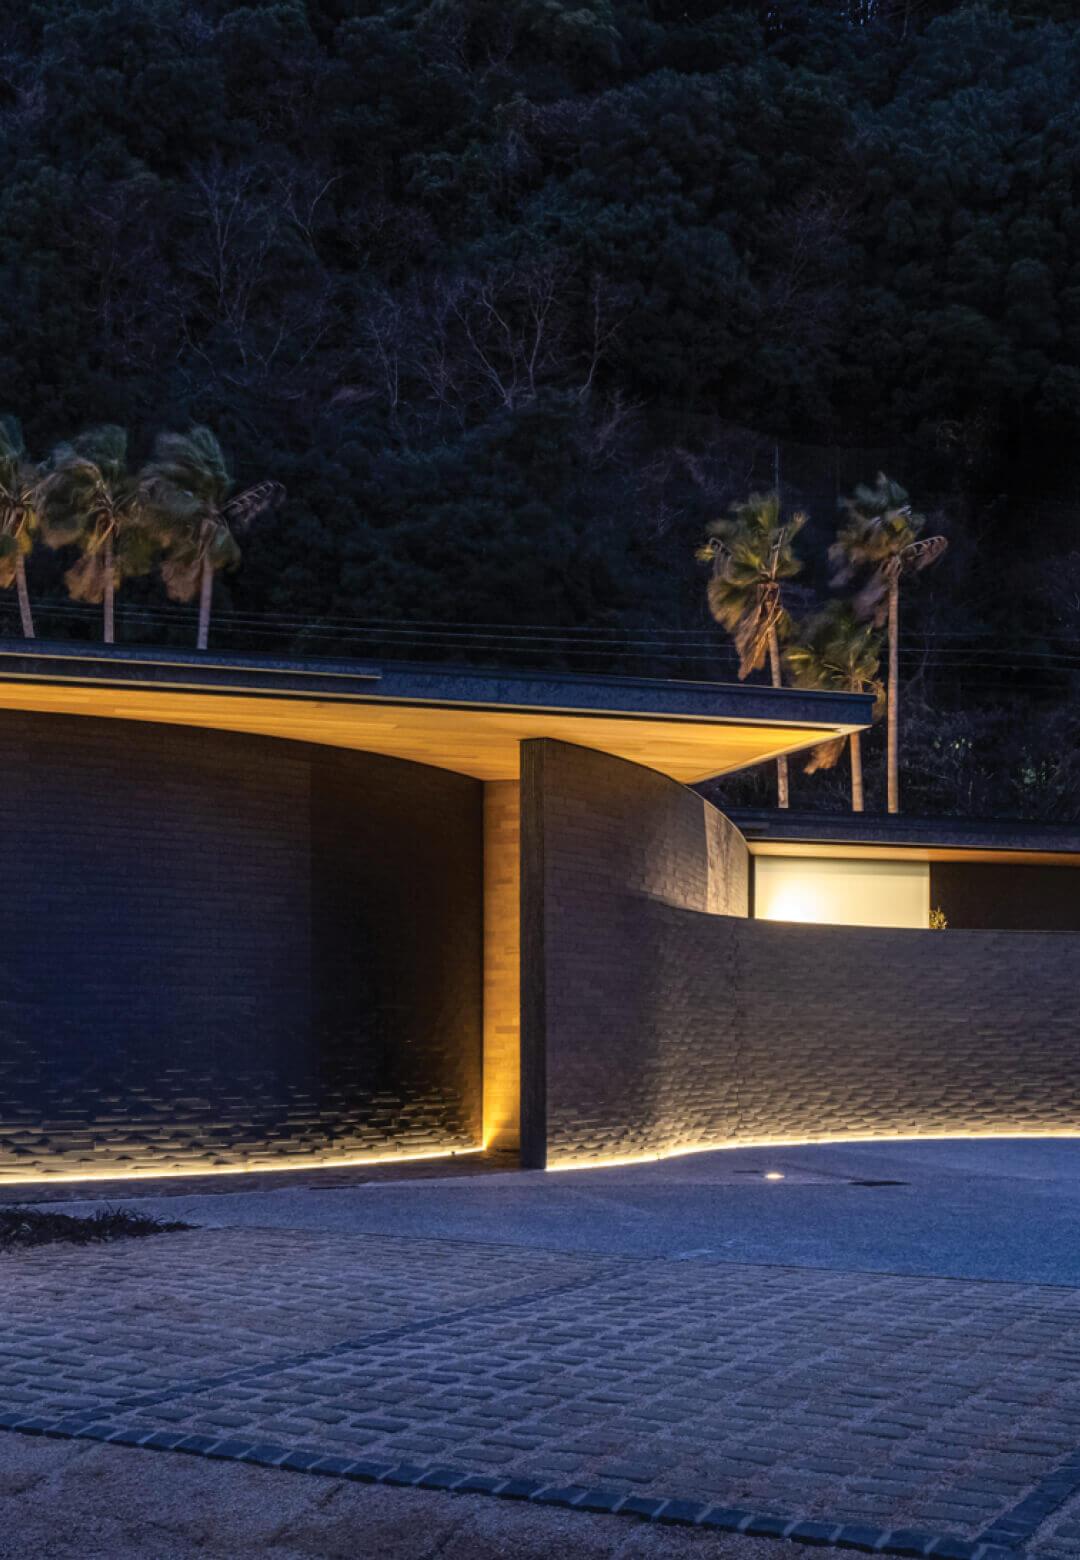 River Sea designed by Japanese studio Kawazoe Architects | River Sea by Kawazoe Architects | STIRworld